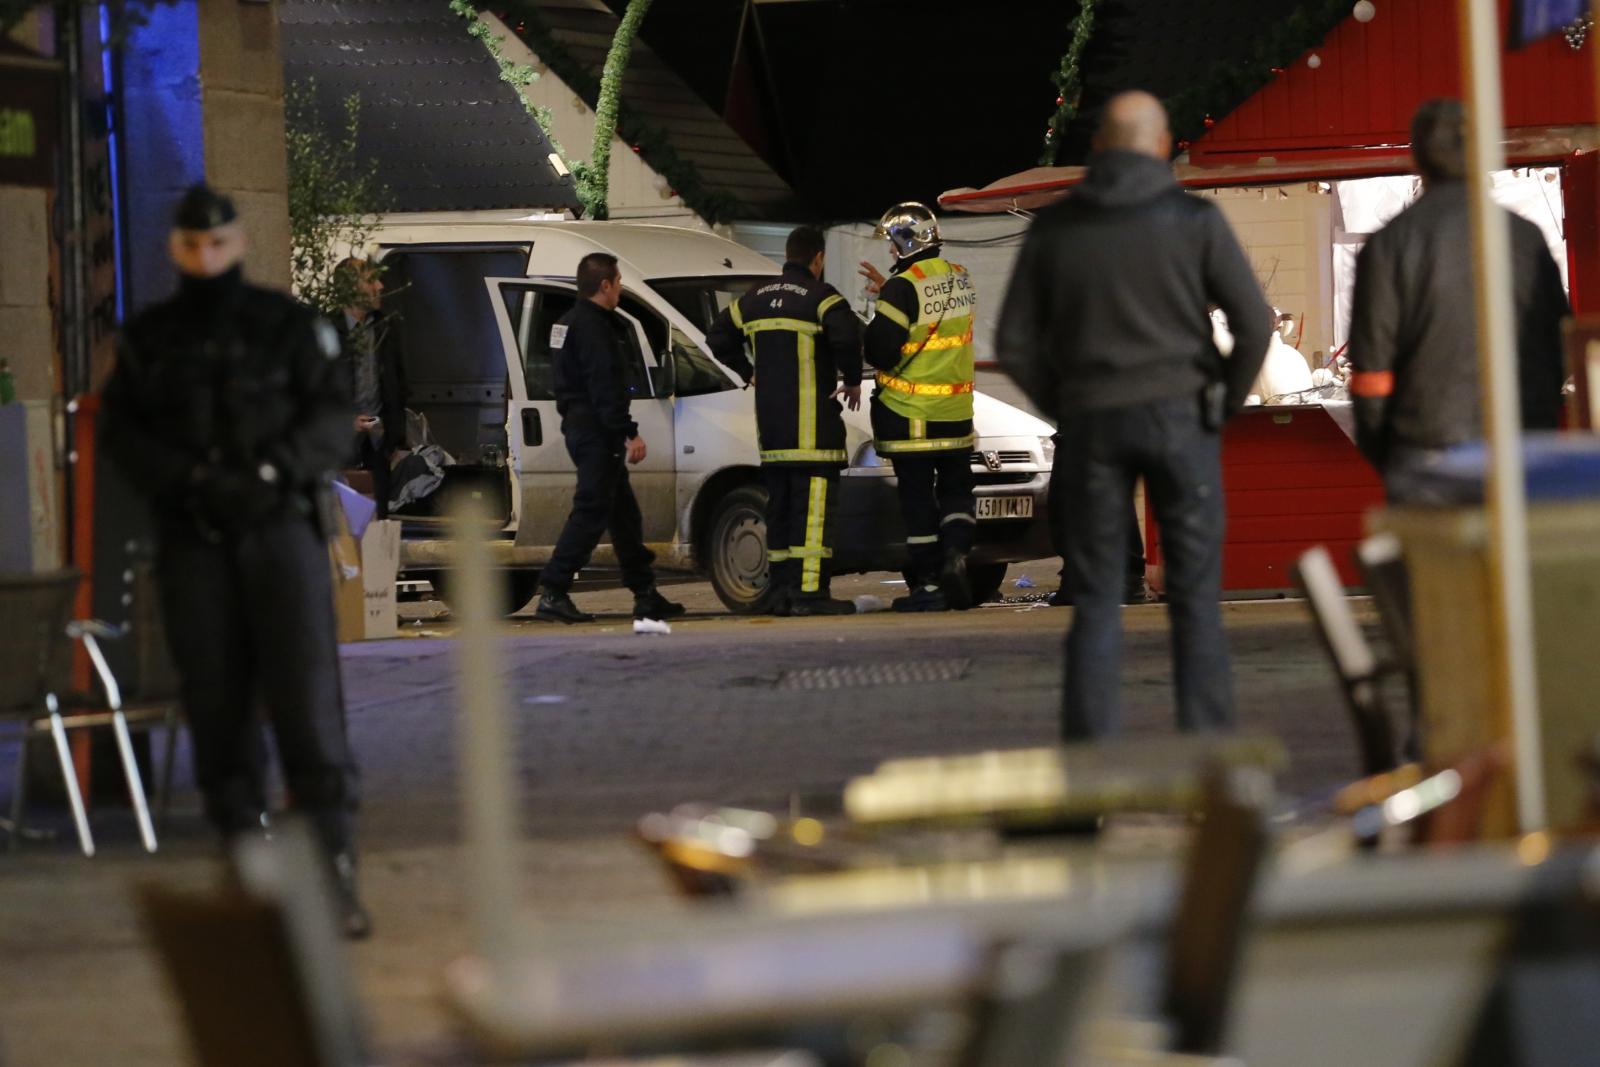 Nantes Christmas market attack